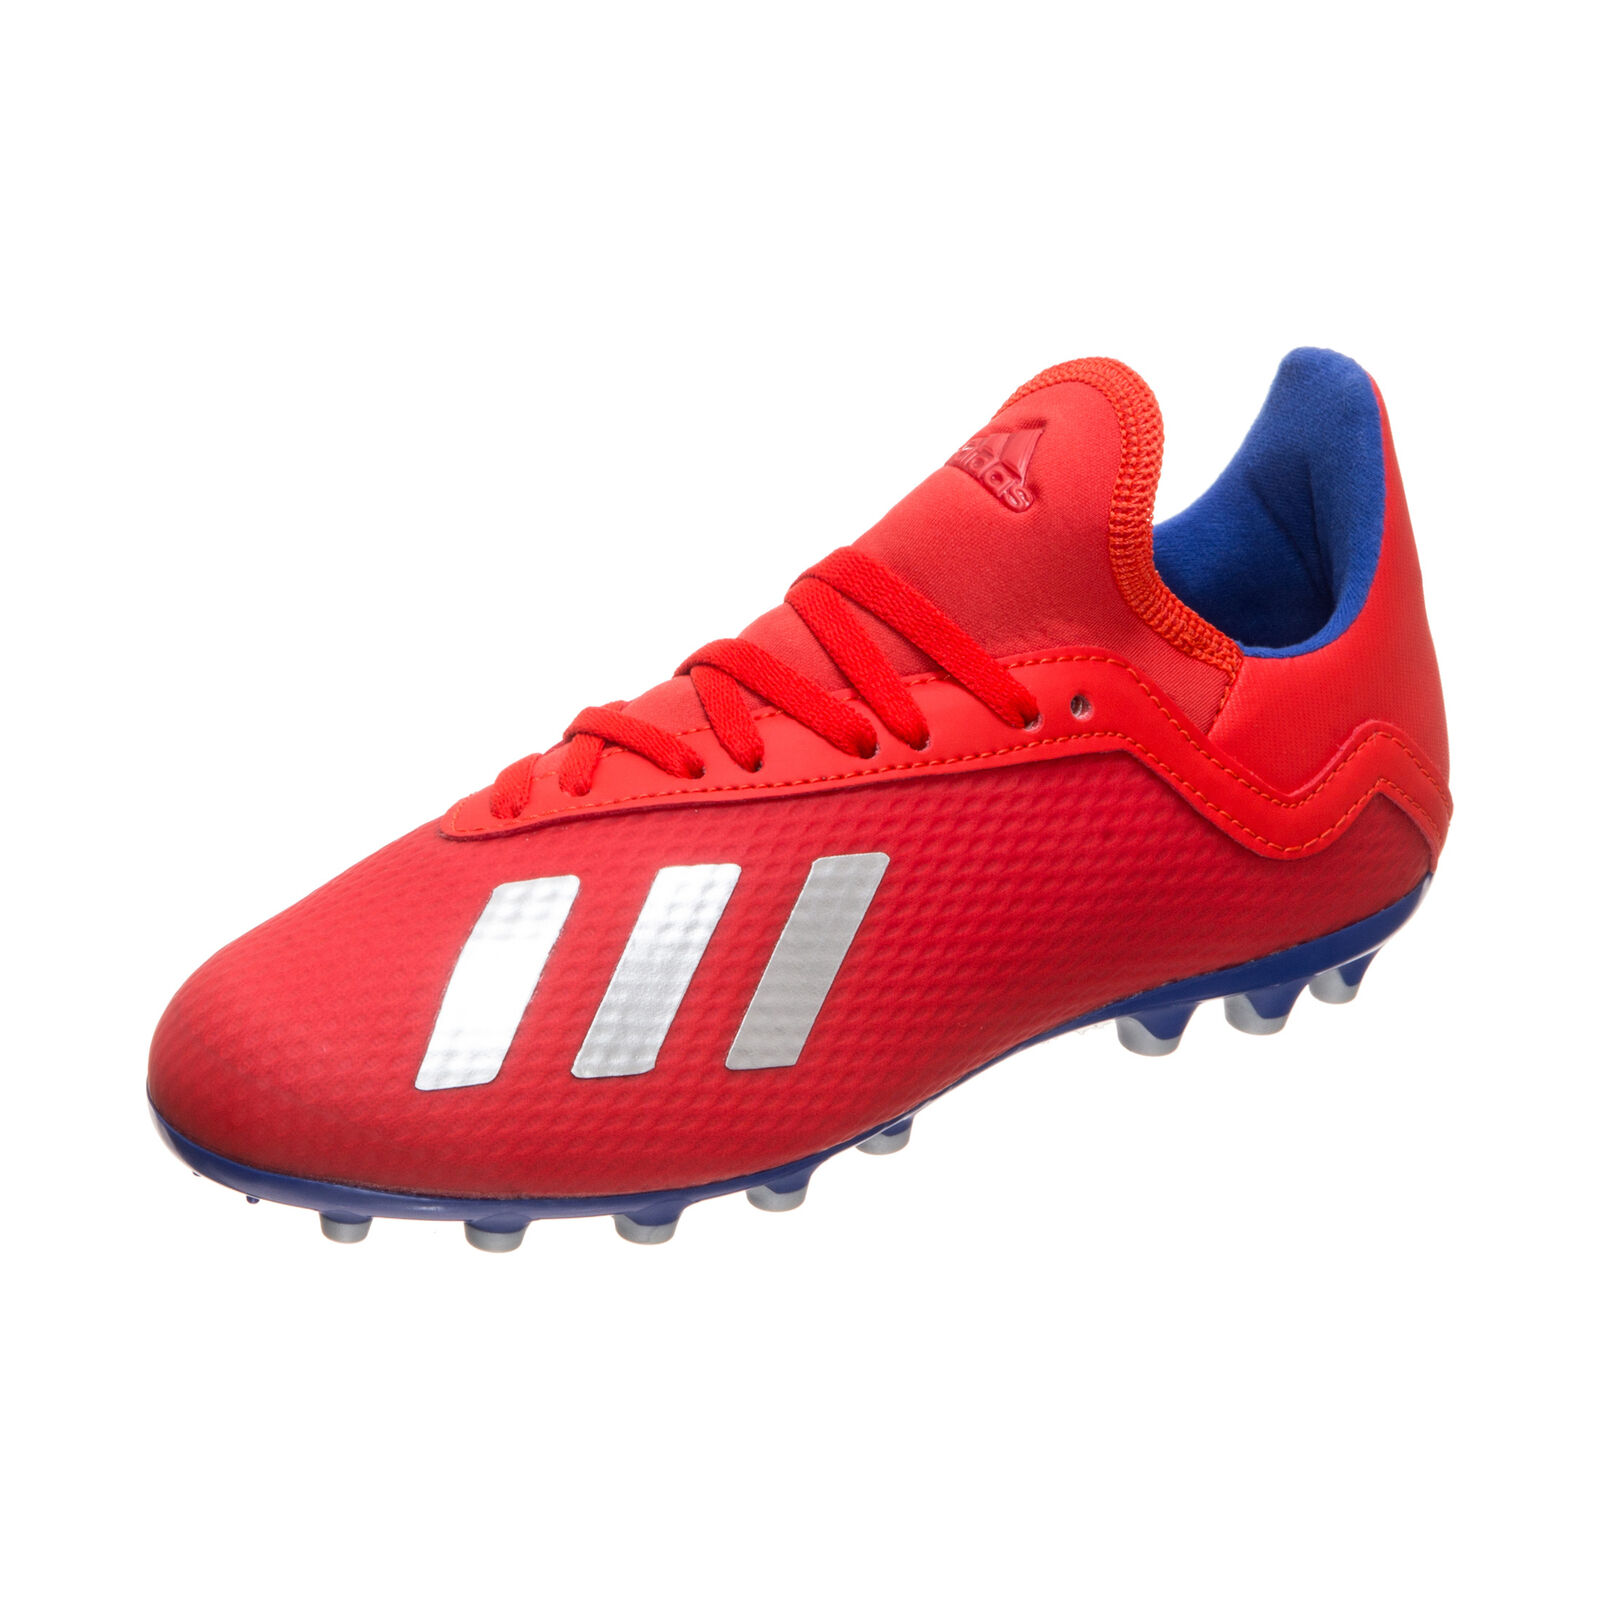 Adidas Performance X 18.3 18.3 18.3 AG Fußballschuh Kinder NEU f6a4d8